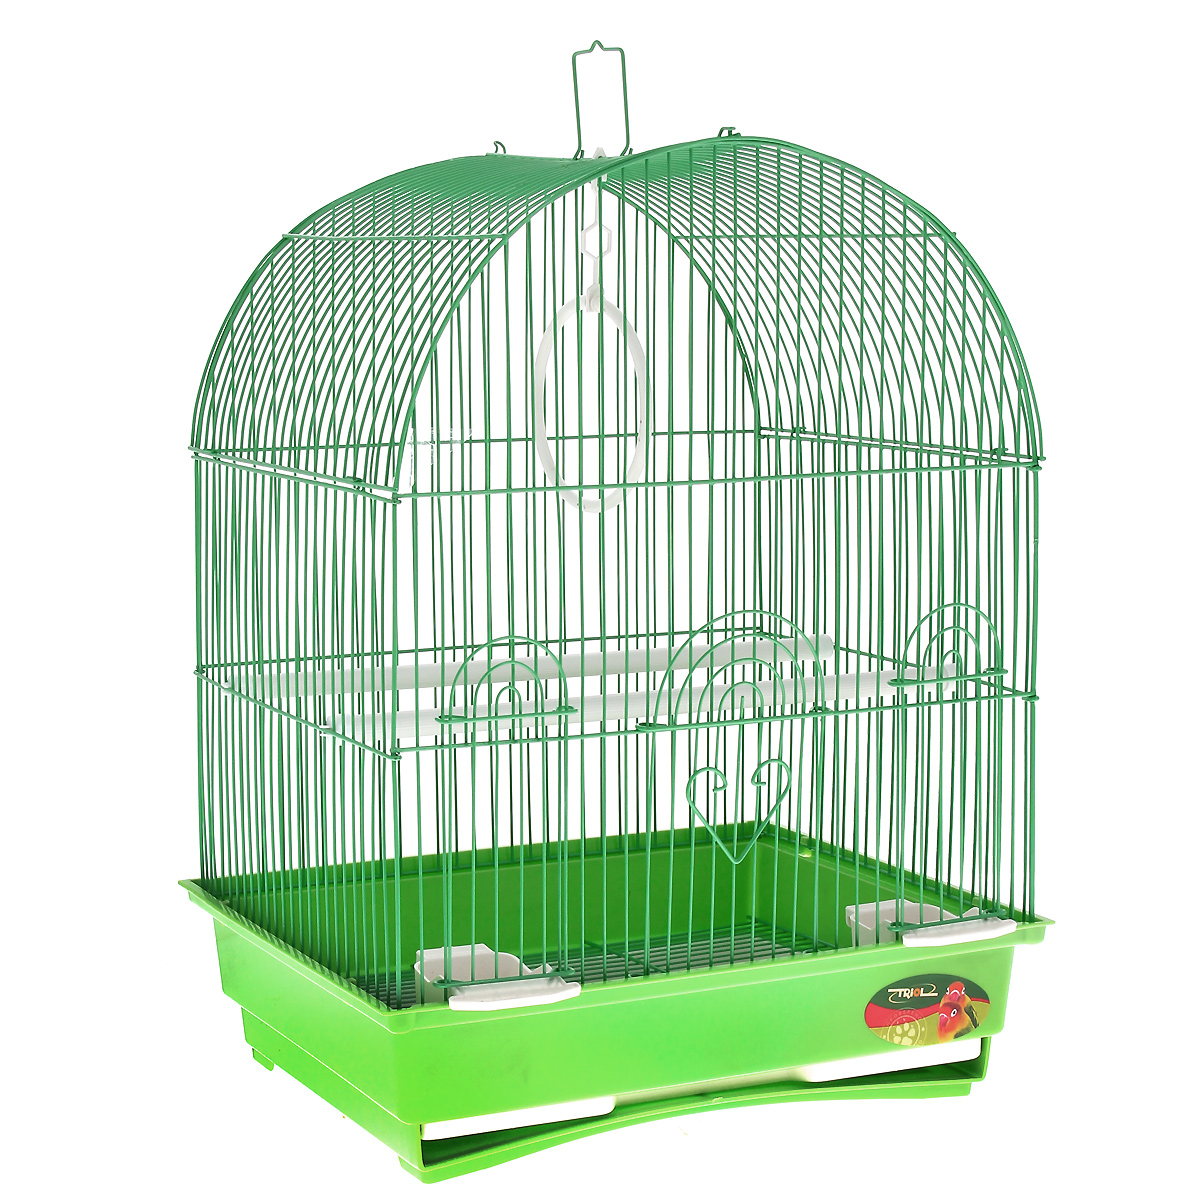 Клетка для птиц, цвет: зеленый, 35 см х 28 см х 46 см клетка для мелких животных triol на колесиках 64 см х 43 5 см х 92 5 см